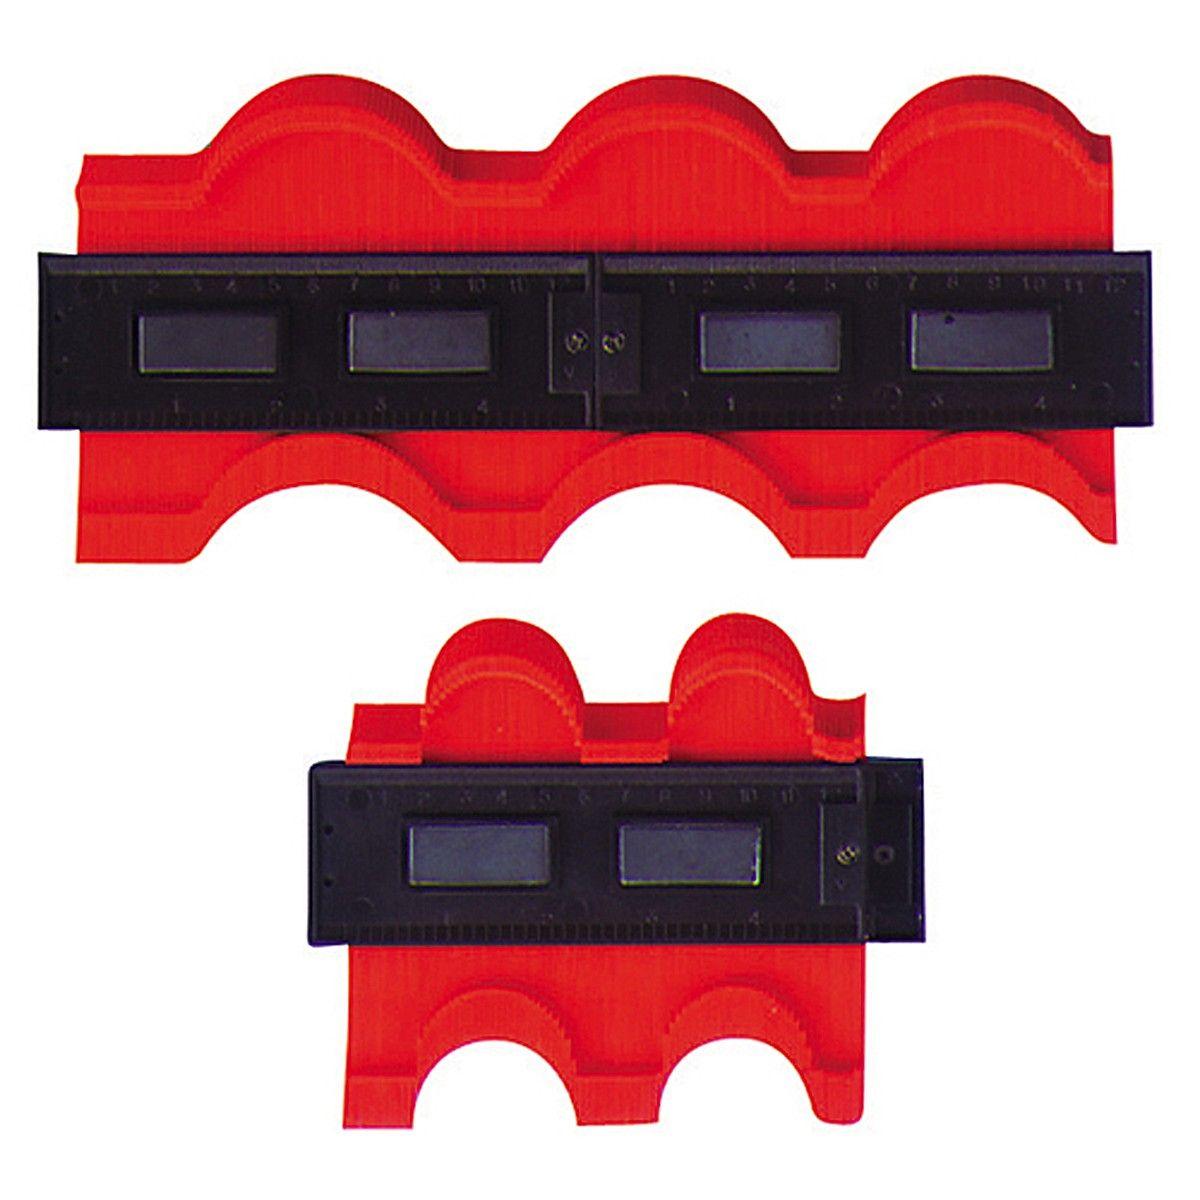 6 in contour gauge contours and gauges contour gauge greentooth Images